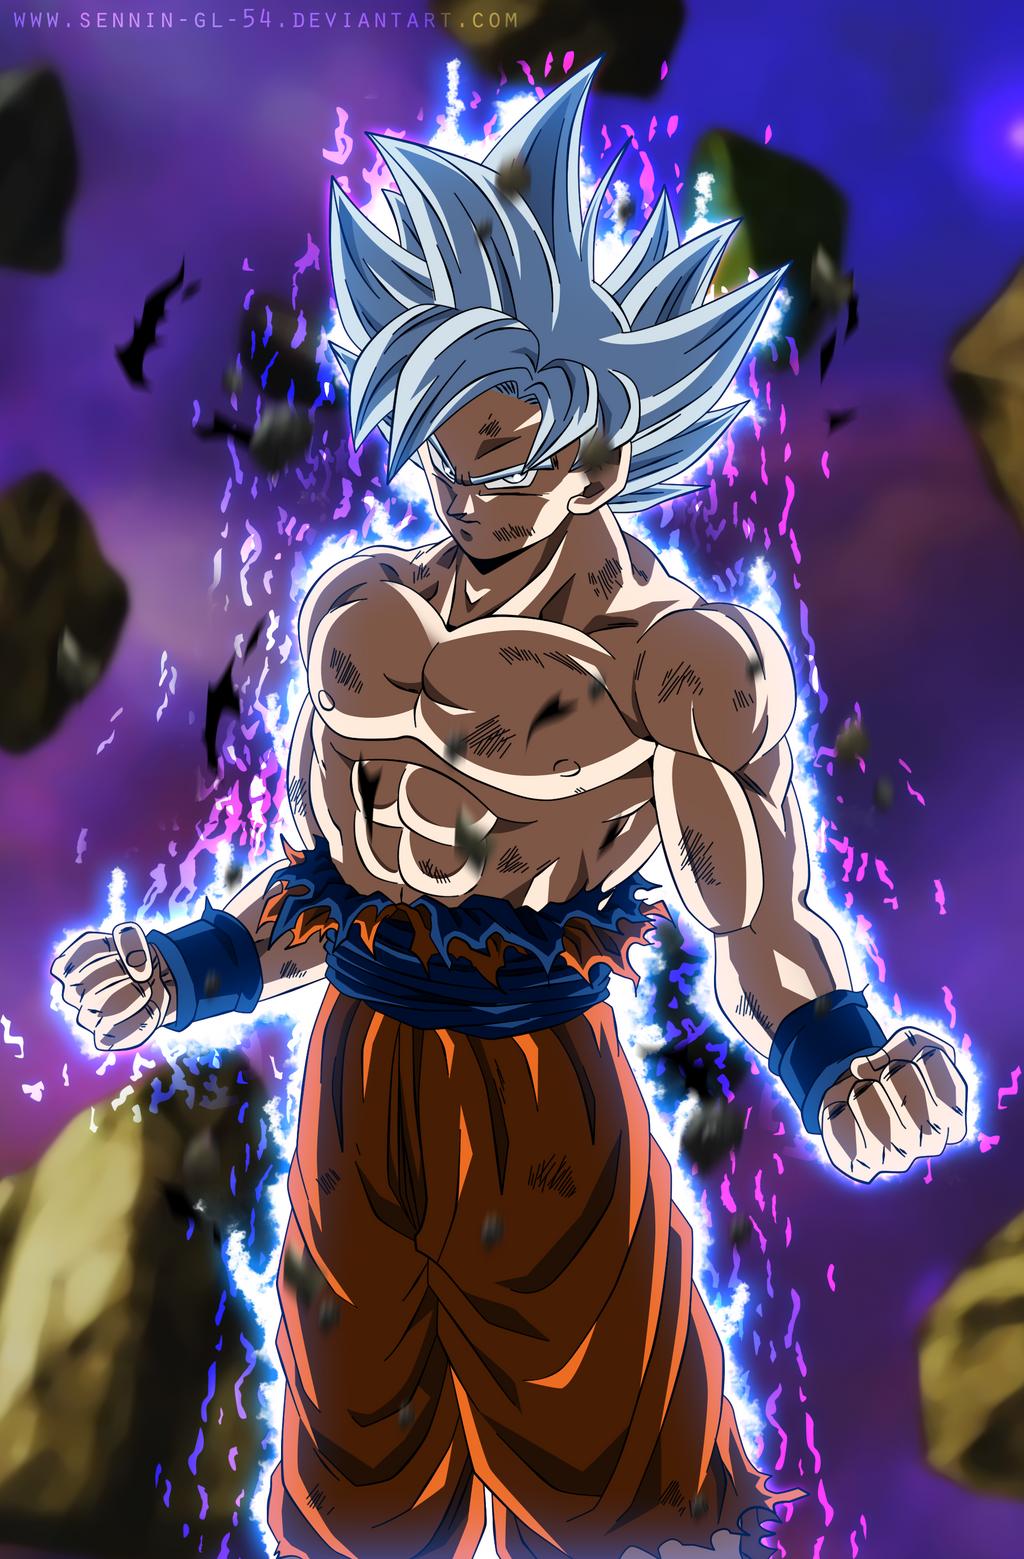 Goku Perfect Ultra Instinct - Silver Goku EP.129 by SenniN-GL-54 on DeviantArt